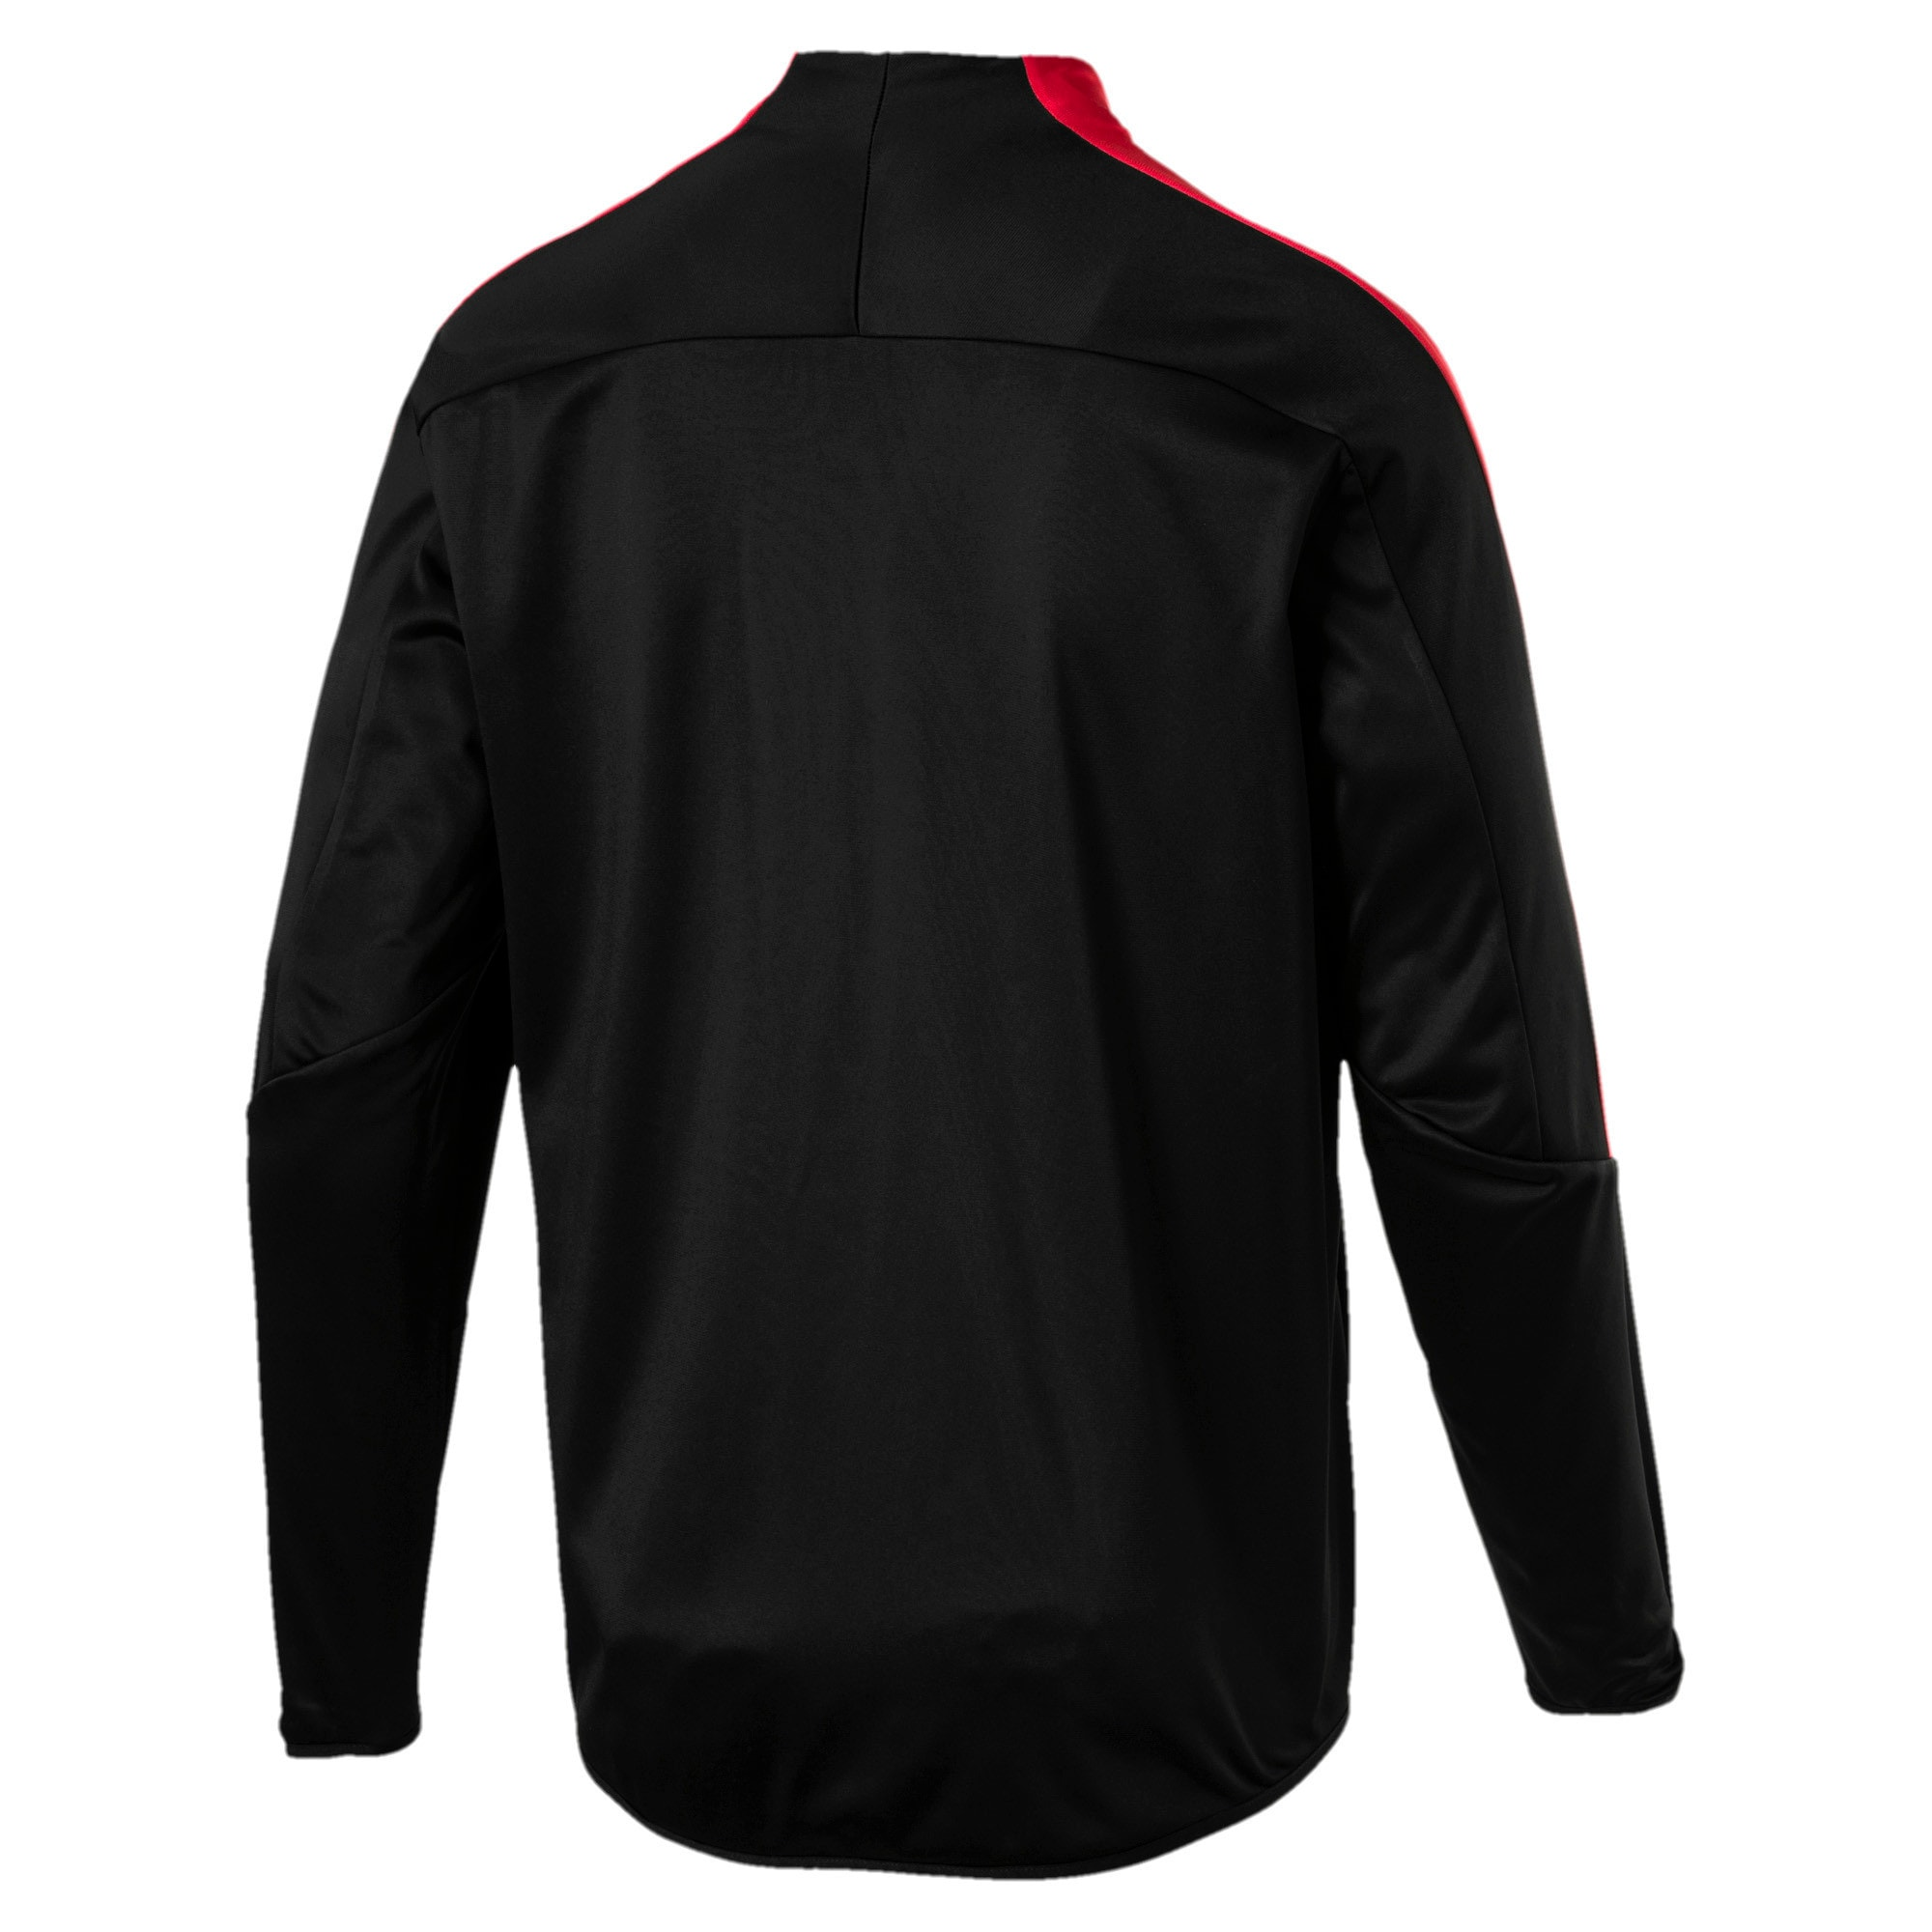 Thumbnail 3 of Ferrari Men's T7 Track Jacket, Puma Black, medium-IND